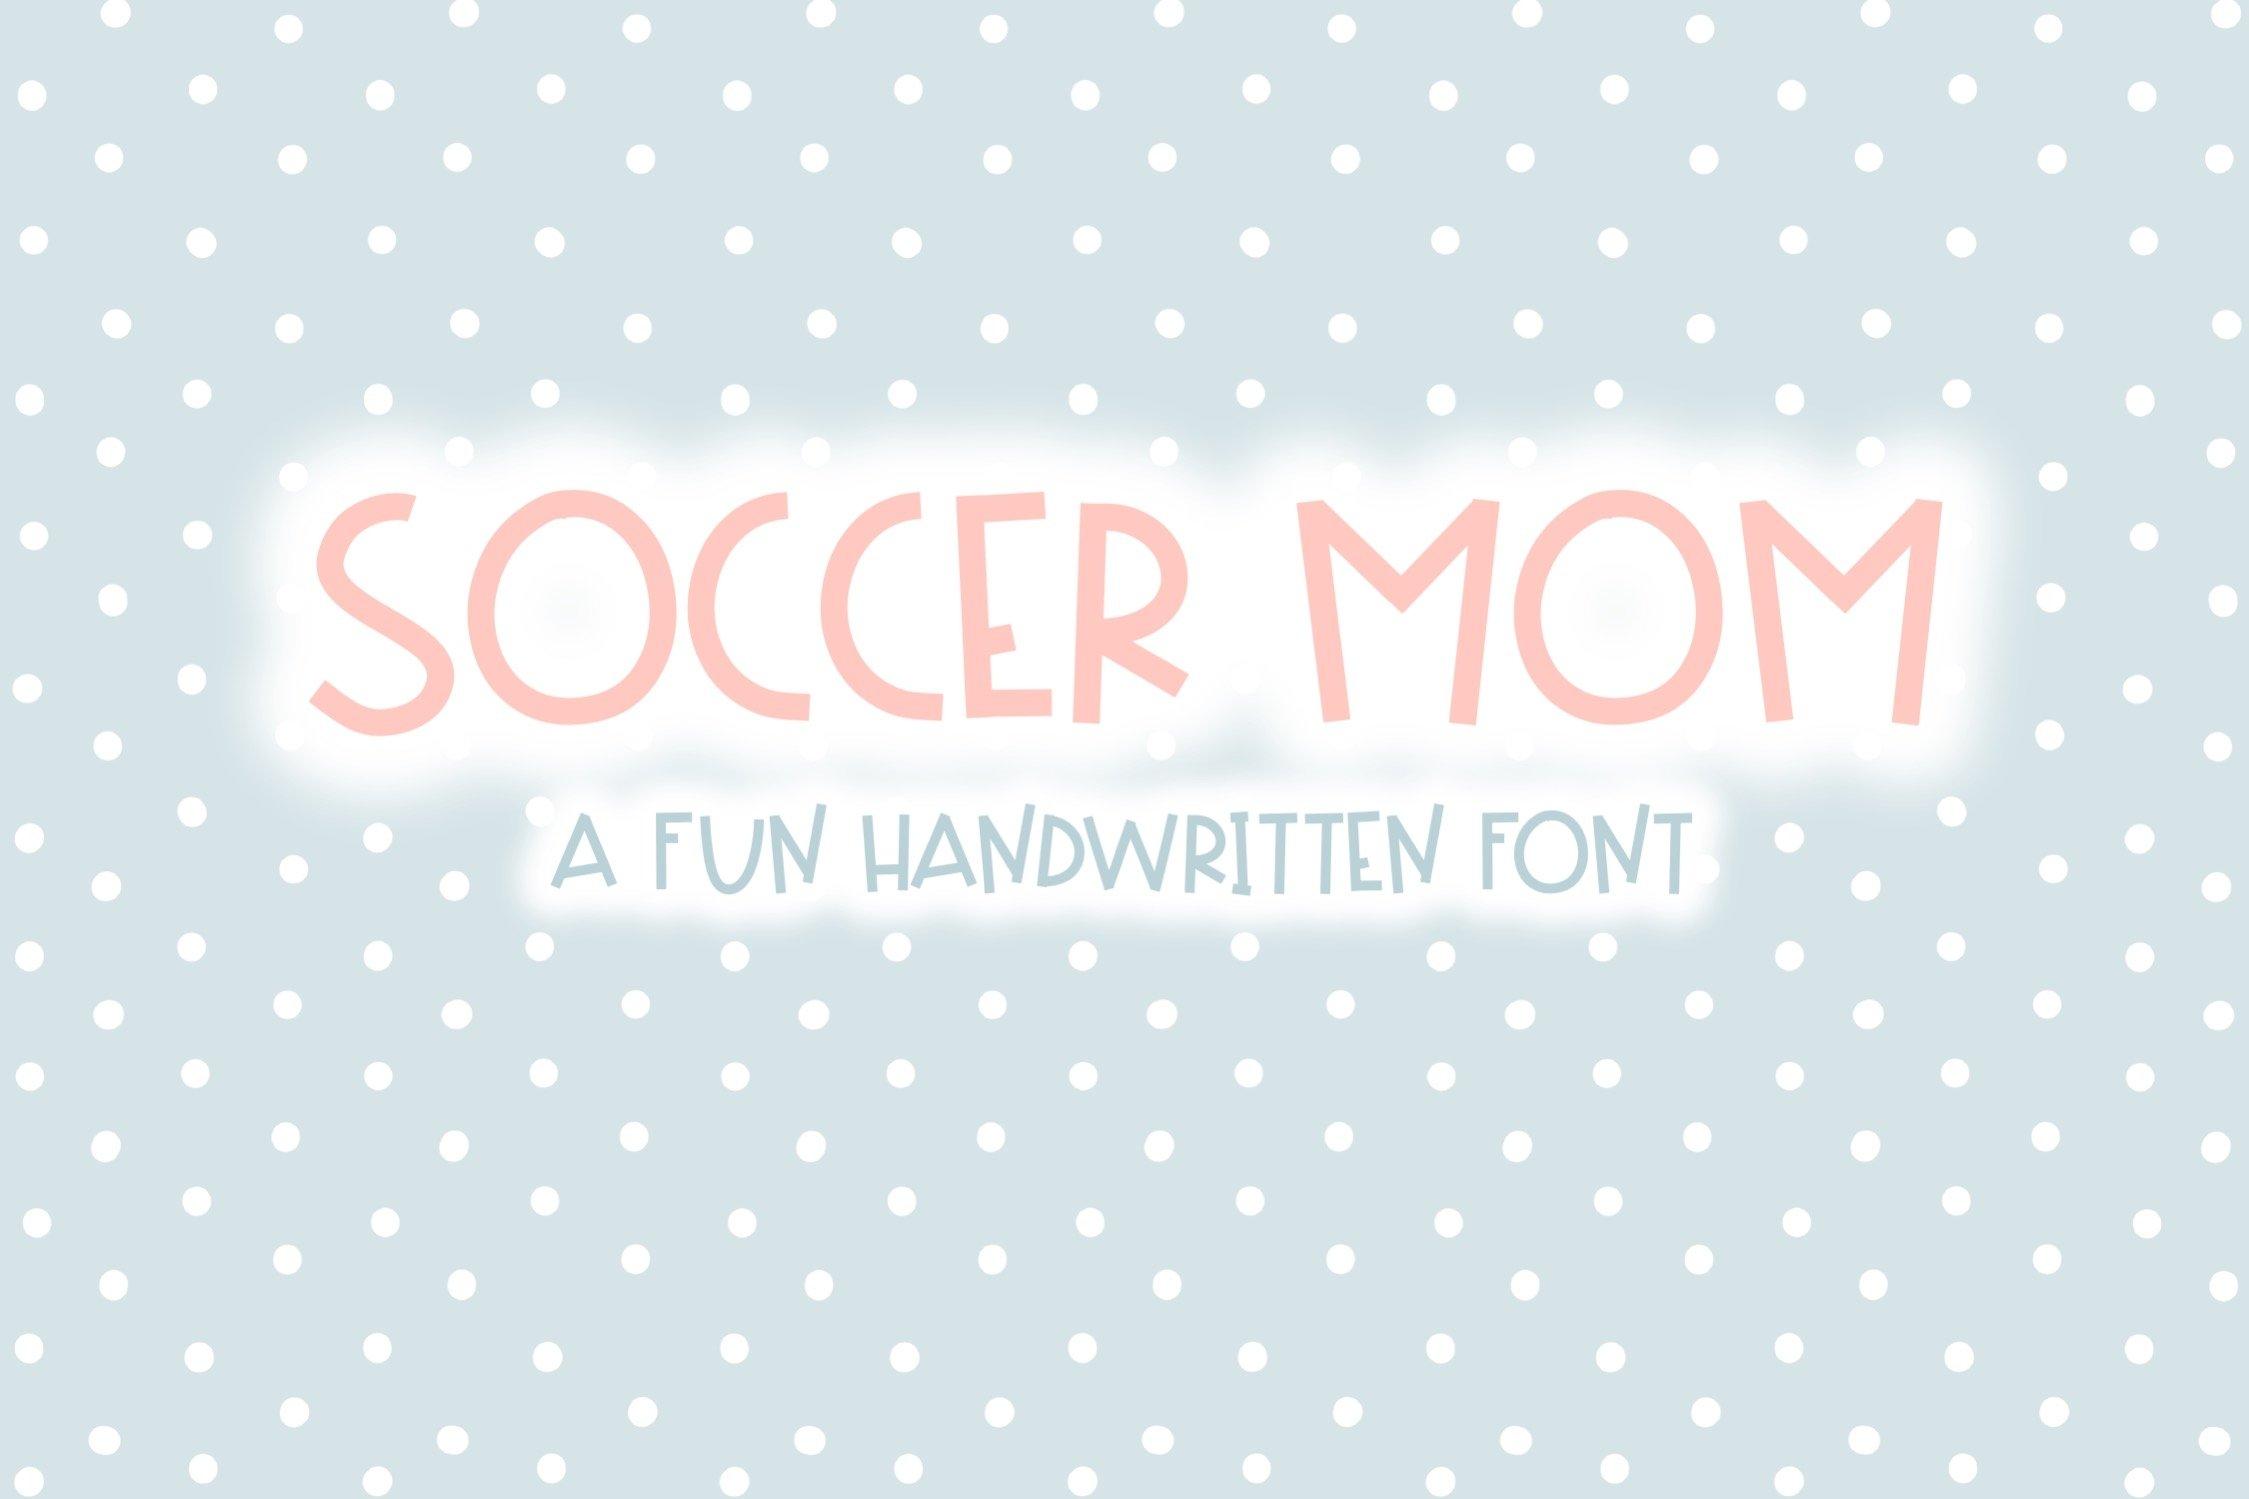 Soccer Mom | Fun Handwritten Font | Bouncy Font example image 1